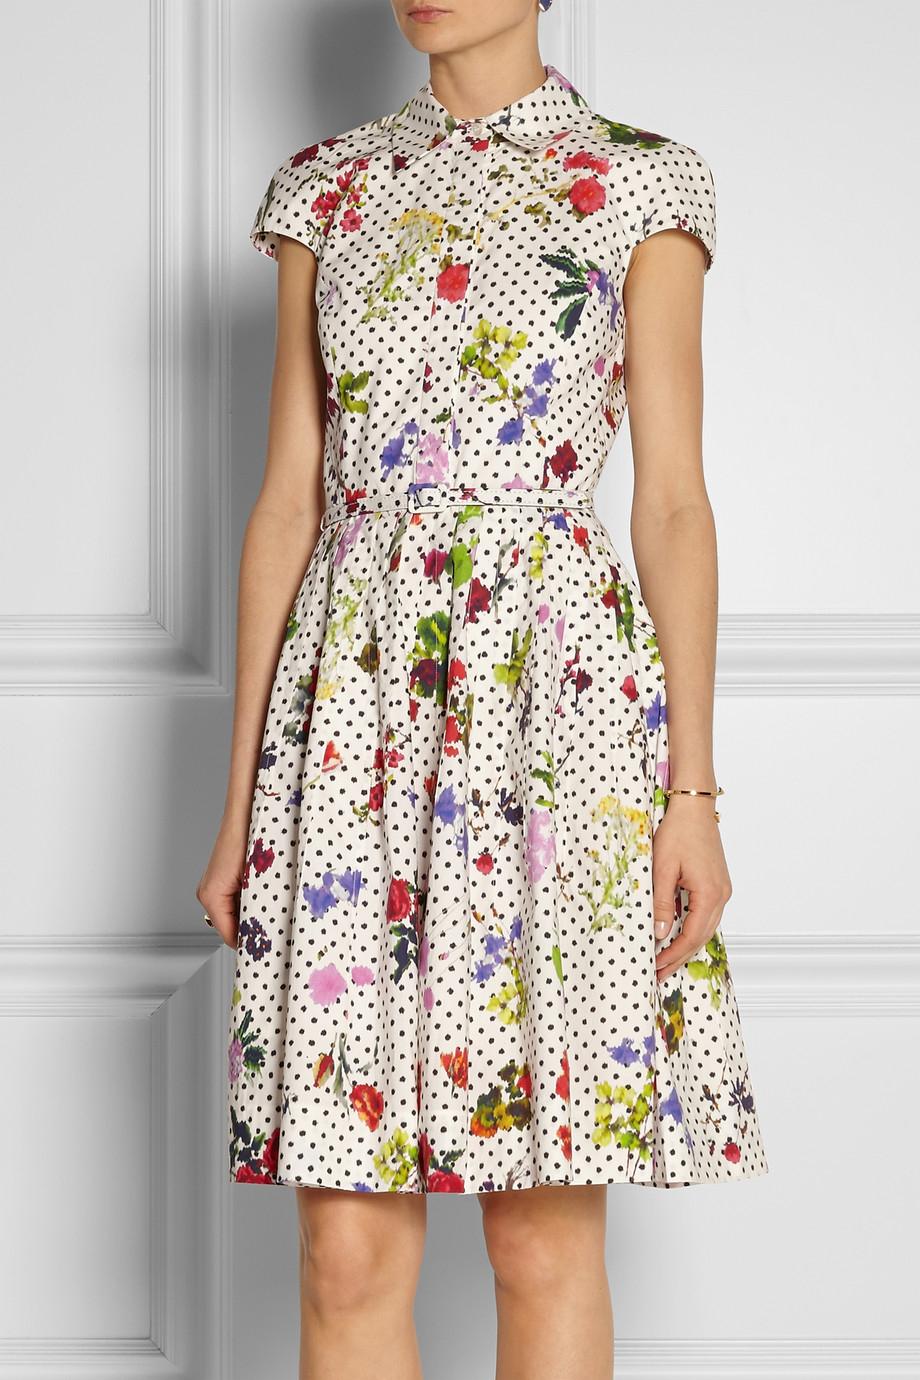 Lyst Oscar De La Renta Floral And Dotprint Cotton Shirt